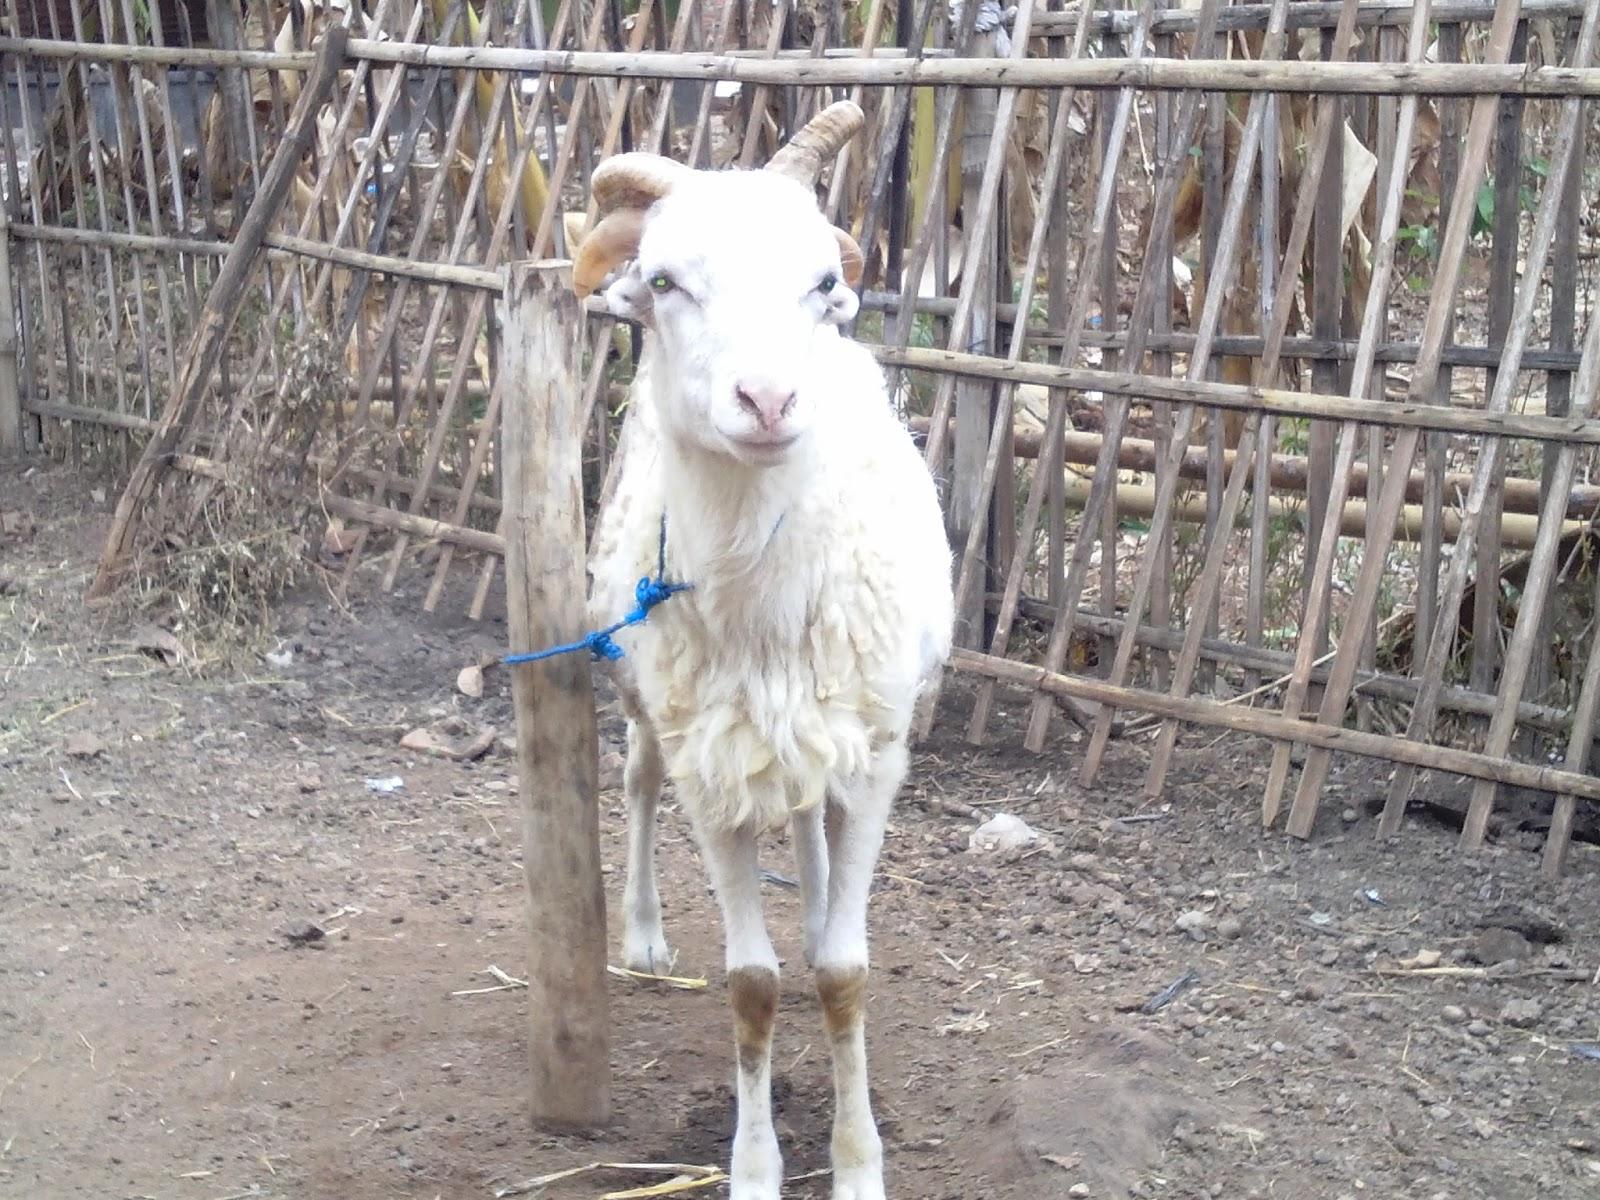 Aqiqah Dan Qurban Murah Mudah Hanya Di Sini Domba Unik Indramayu